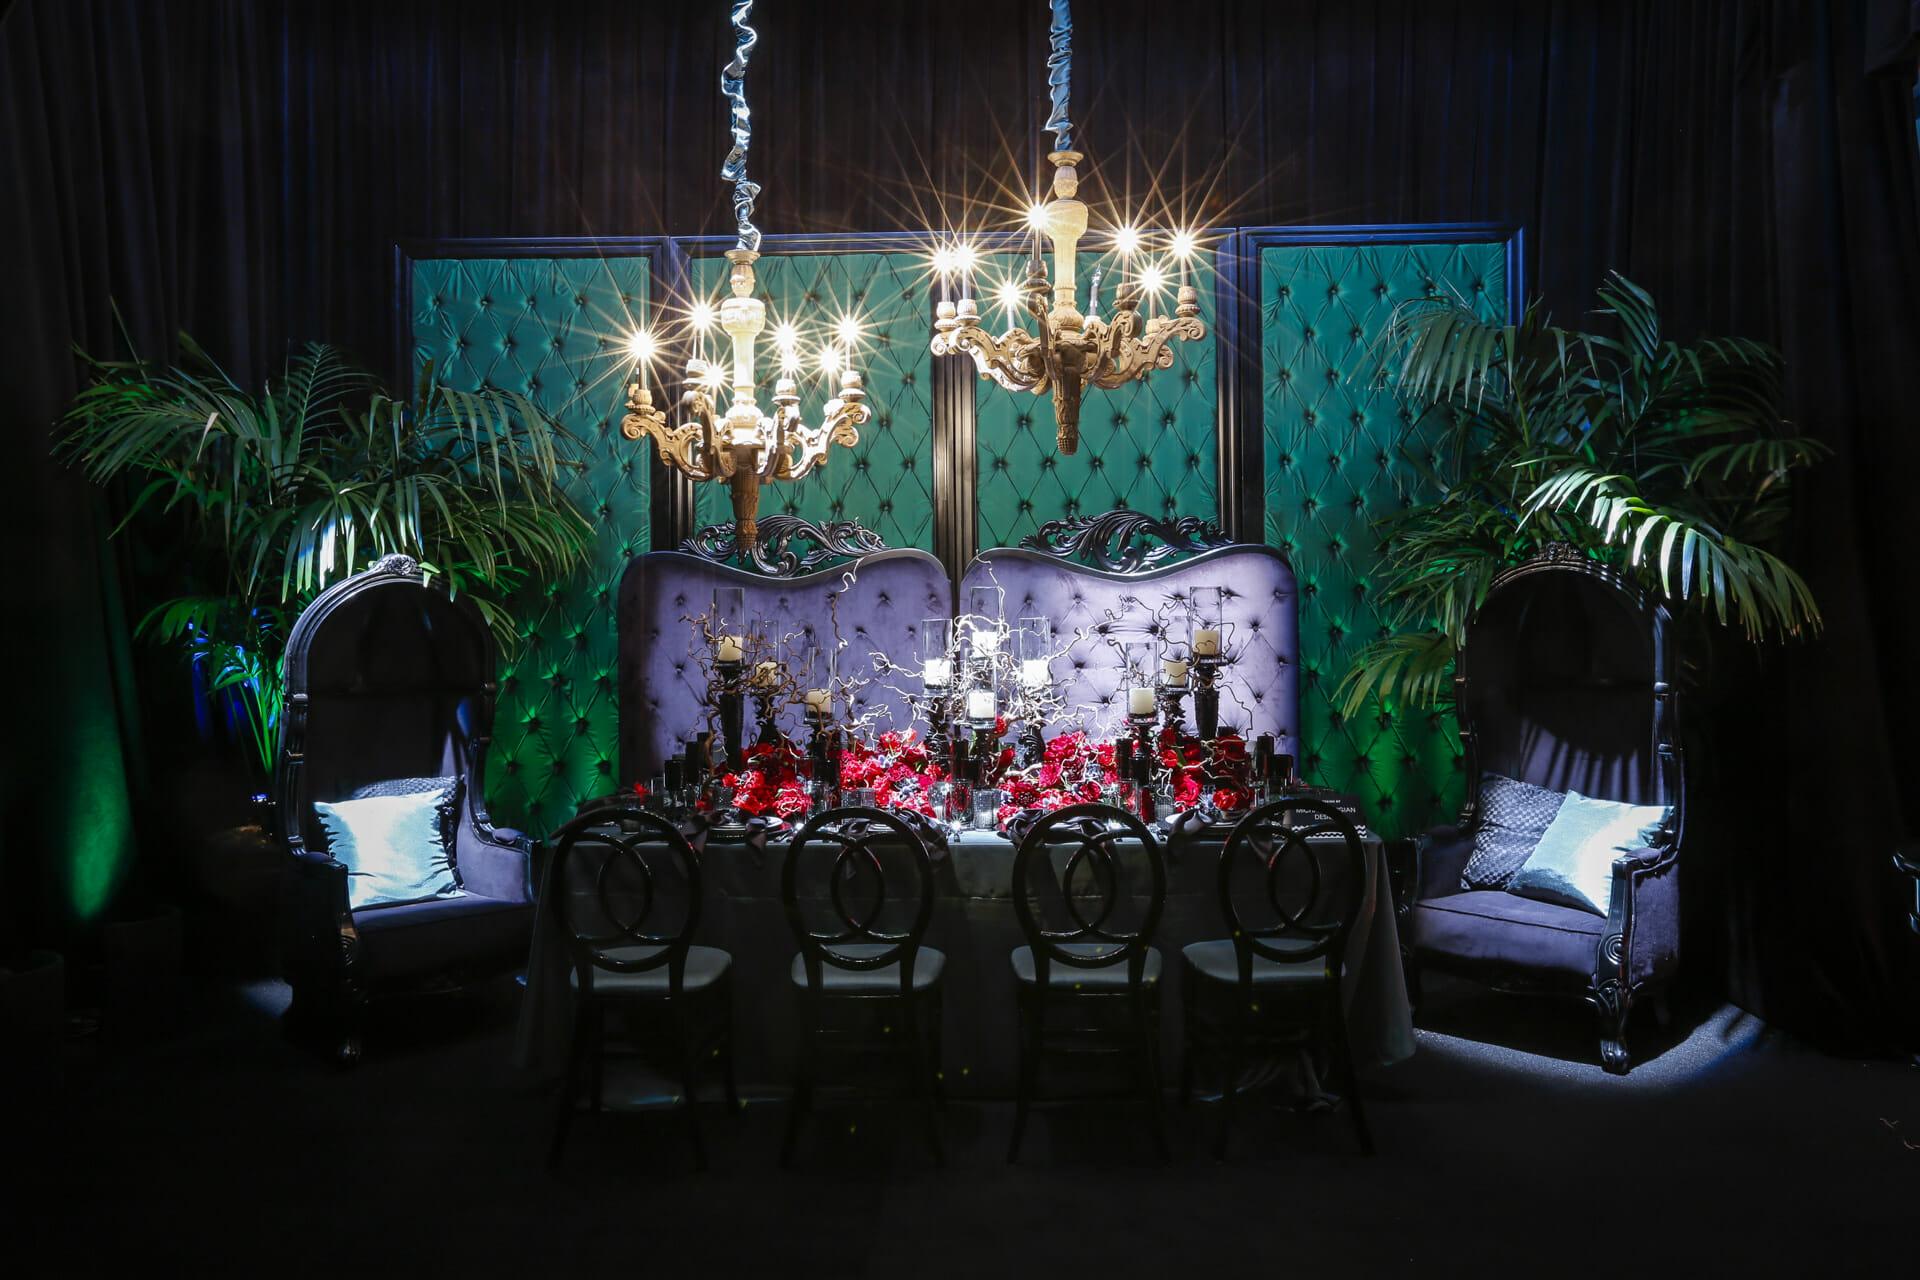 Hartmann Studios & Impact Lighting 2013 Client Appreciation Event - Fort Mason Center, San Francisco, CA, USA